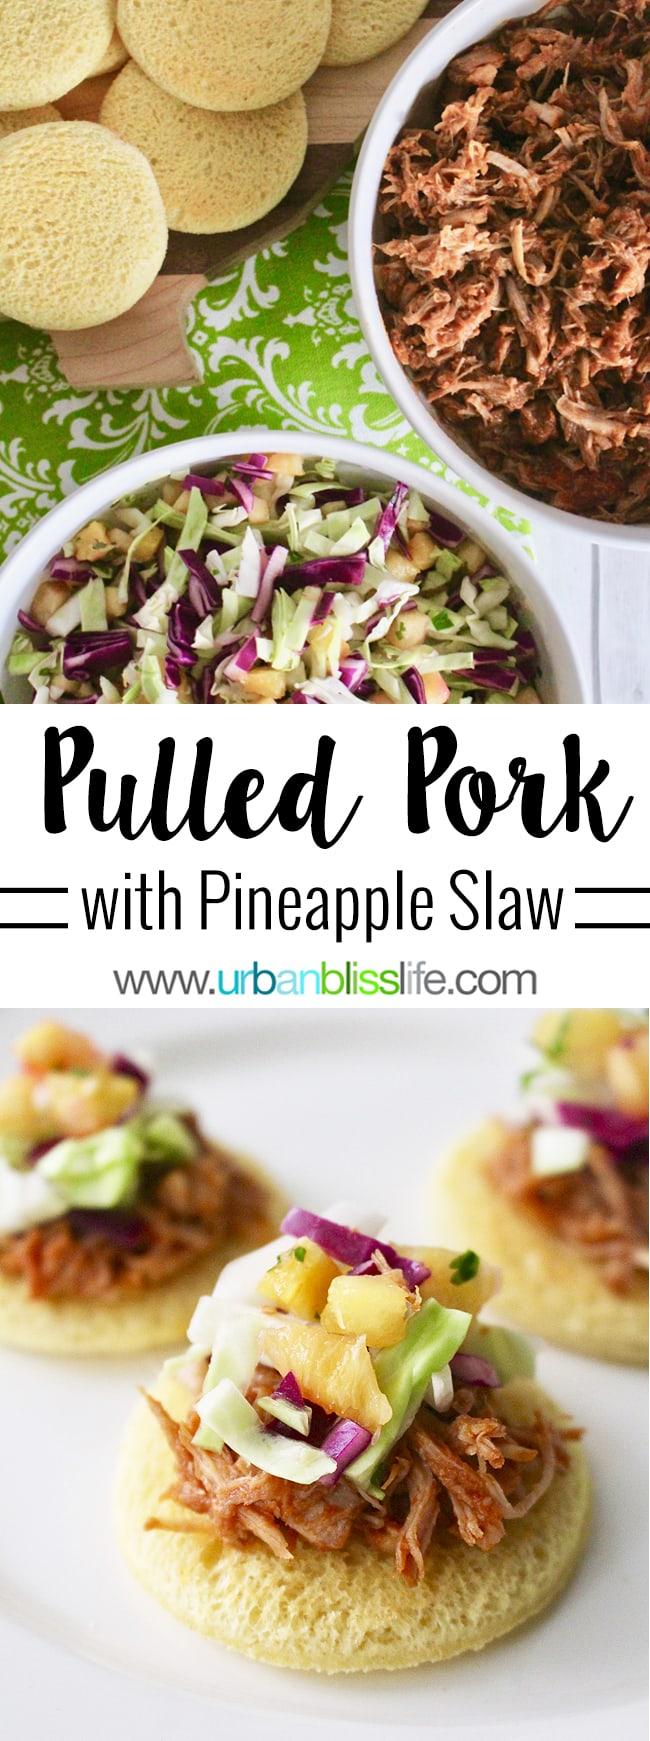 Pulled Pork Sliders with Pineapple Slaw recipe on UrbanBlissLife.com